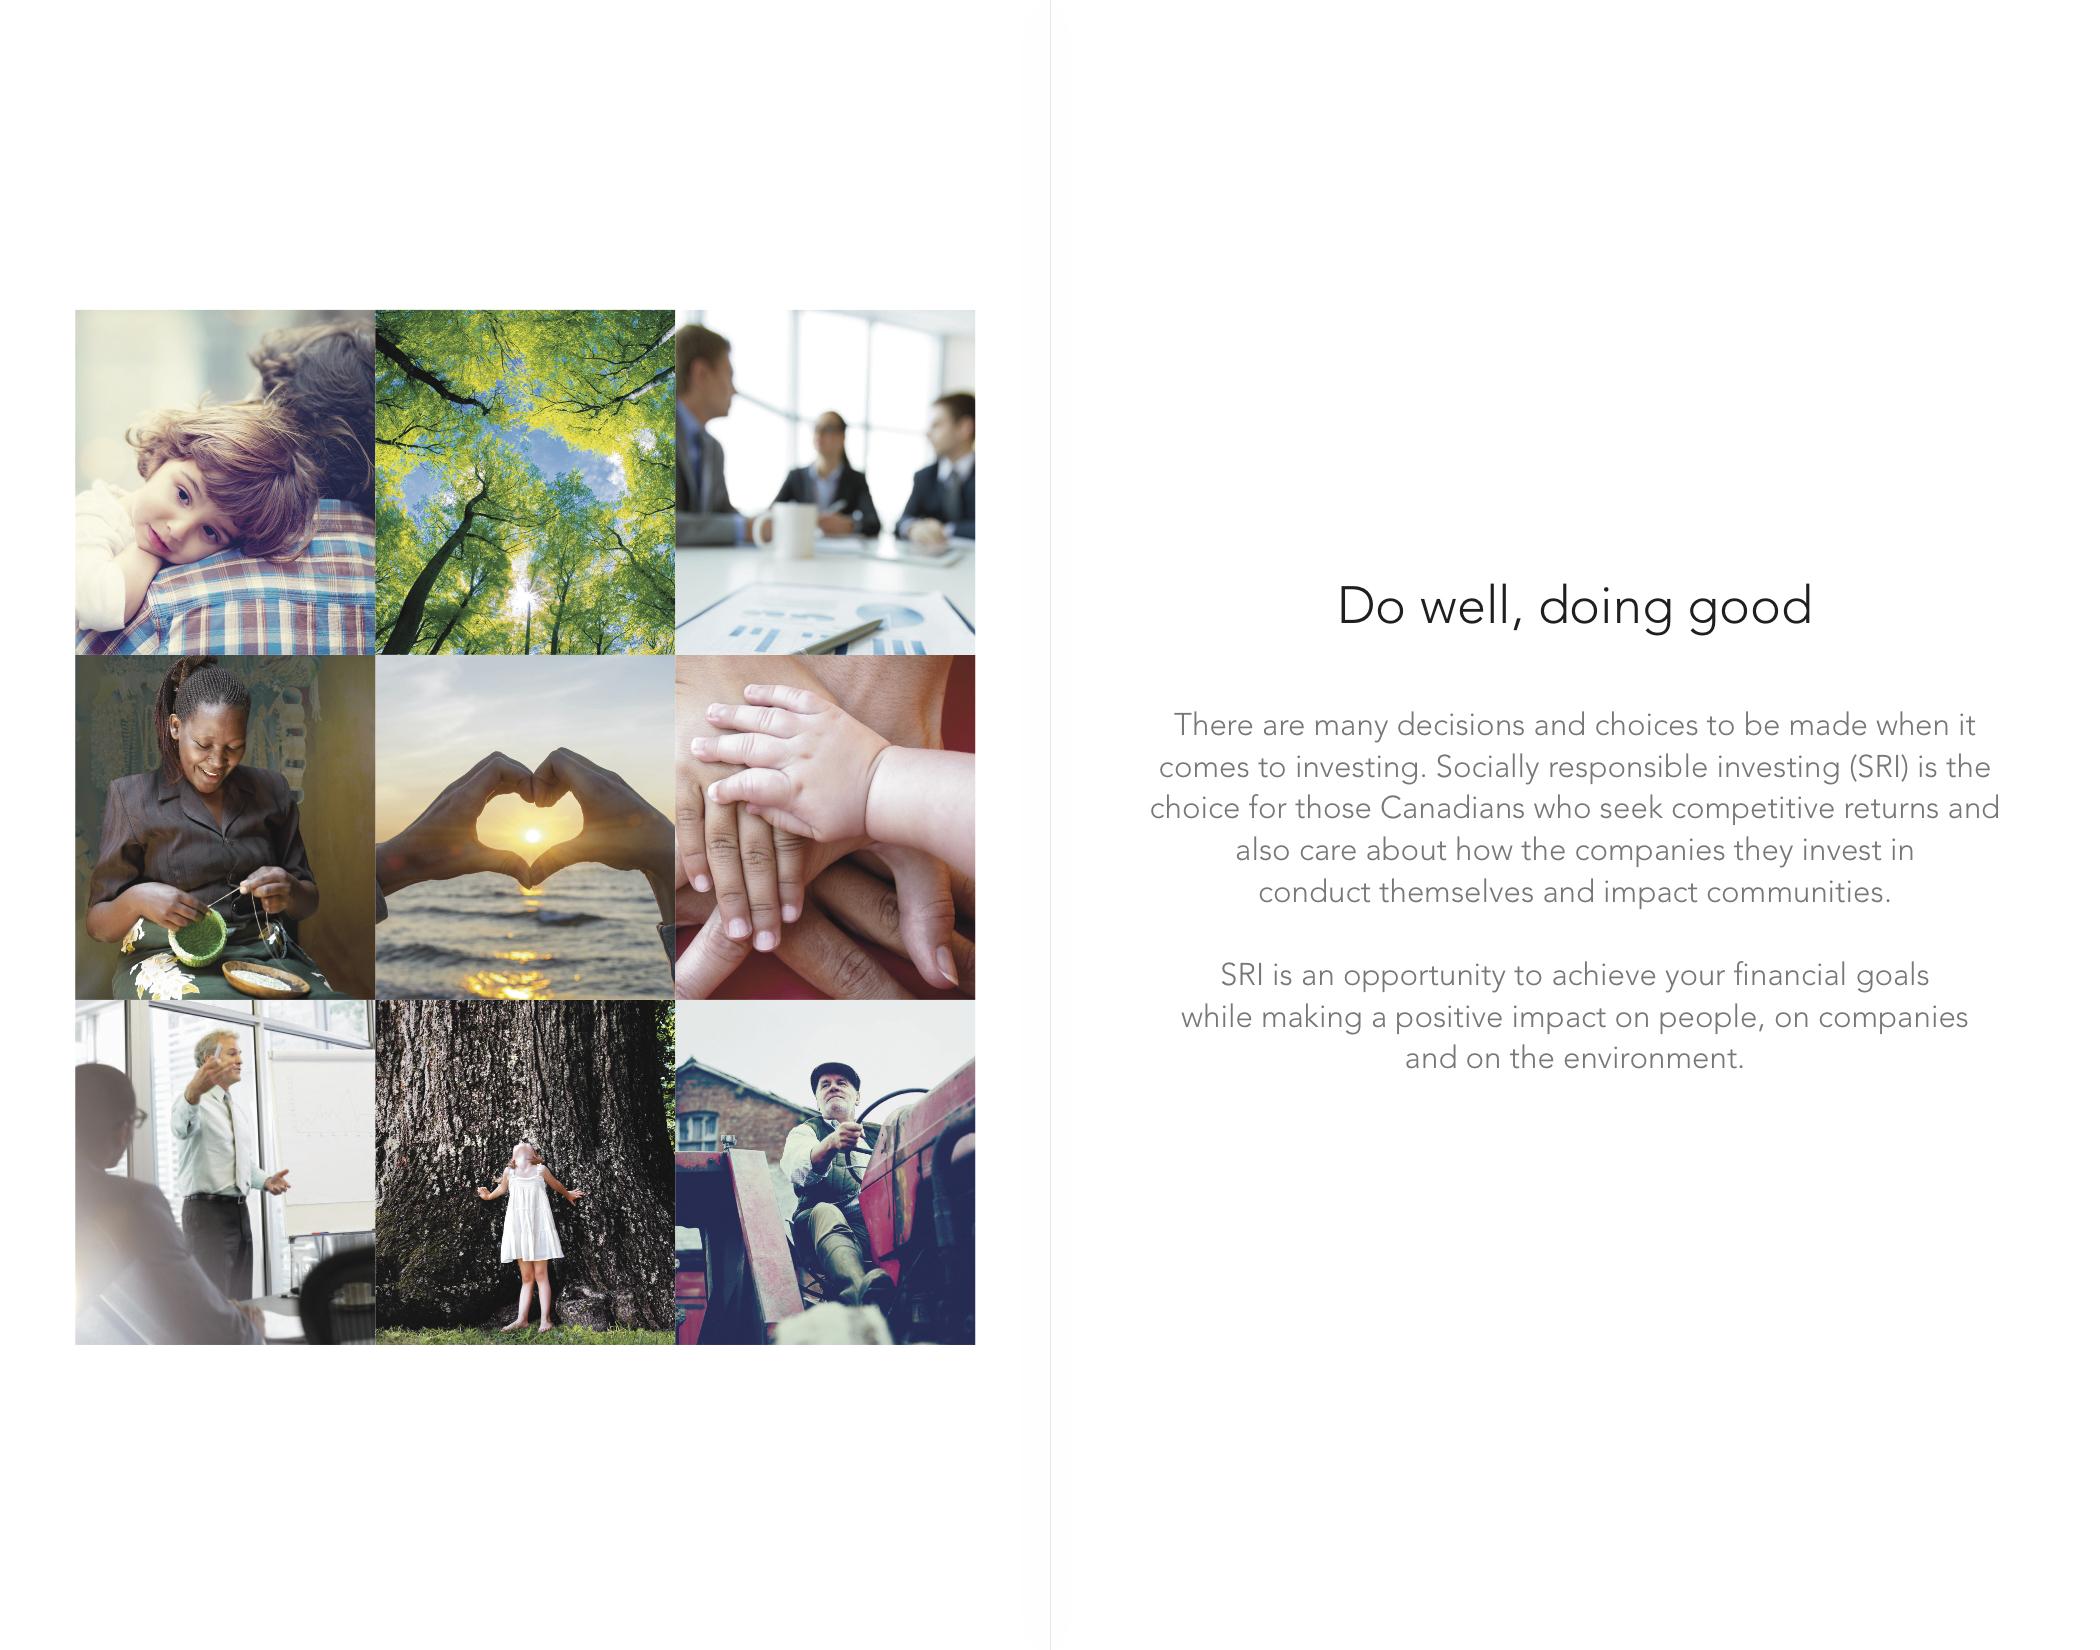 ORII_SRI-brochure_1-2.jpg